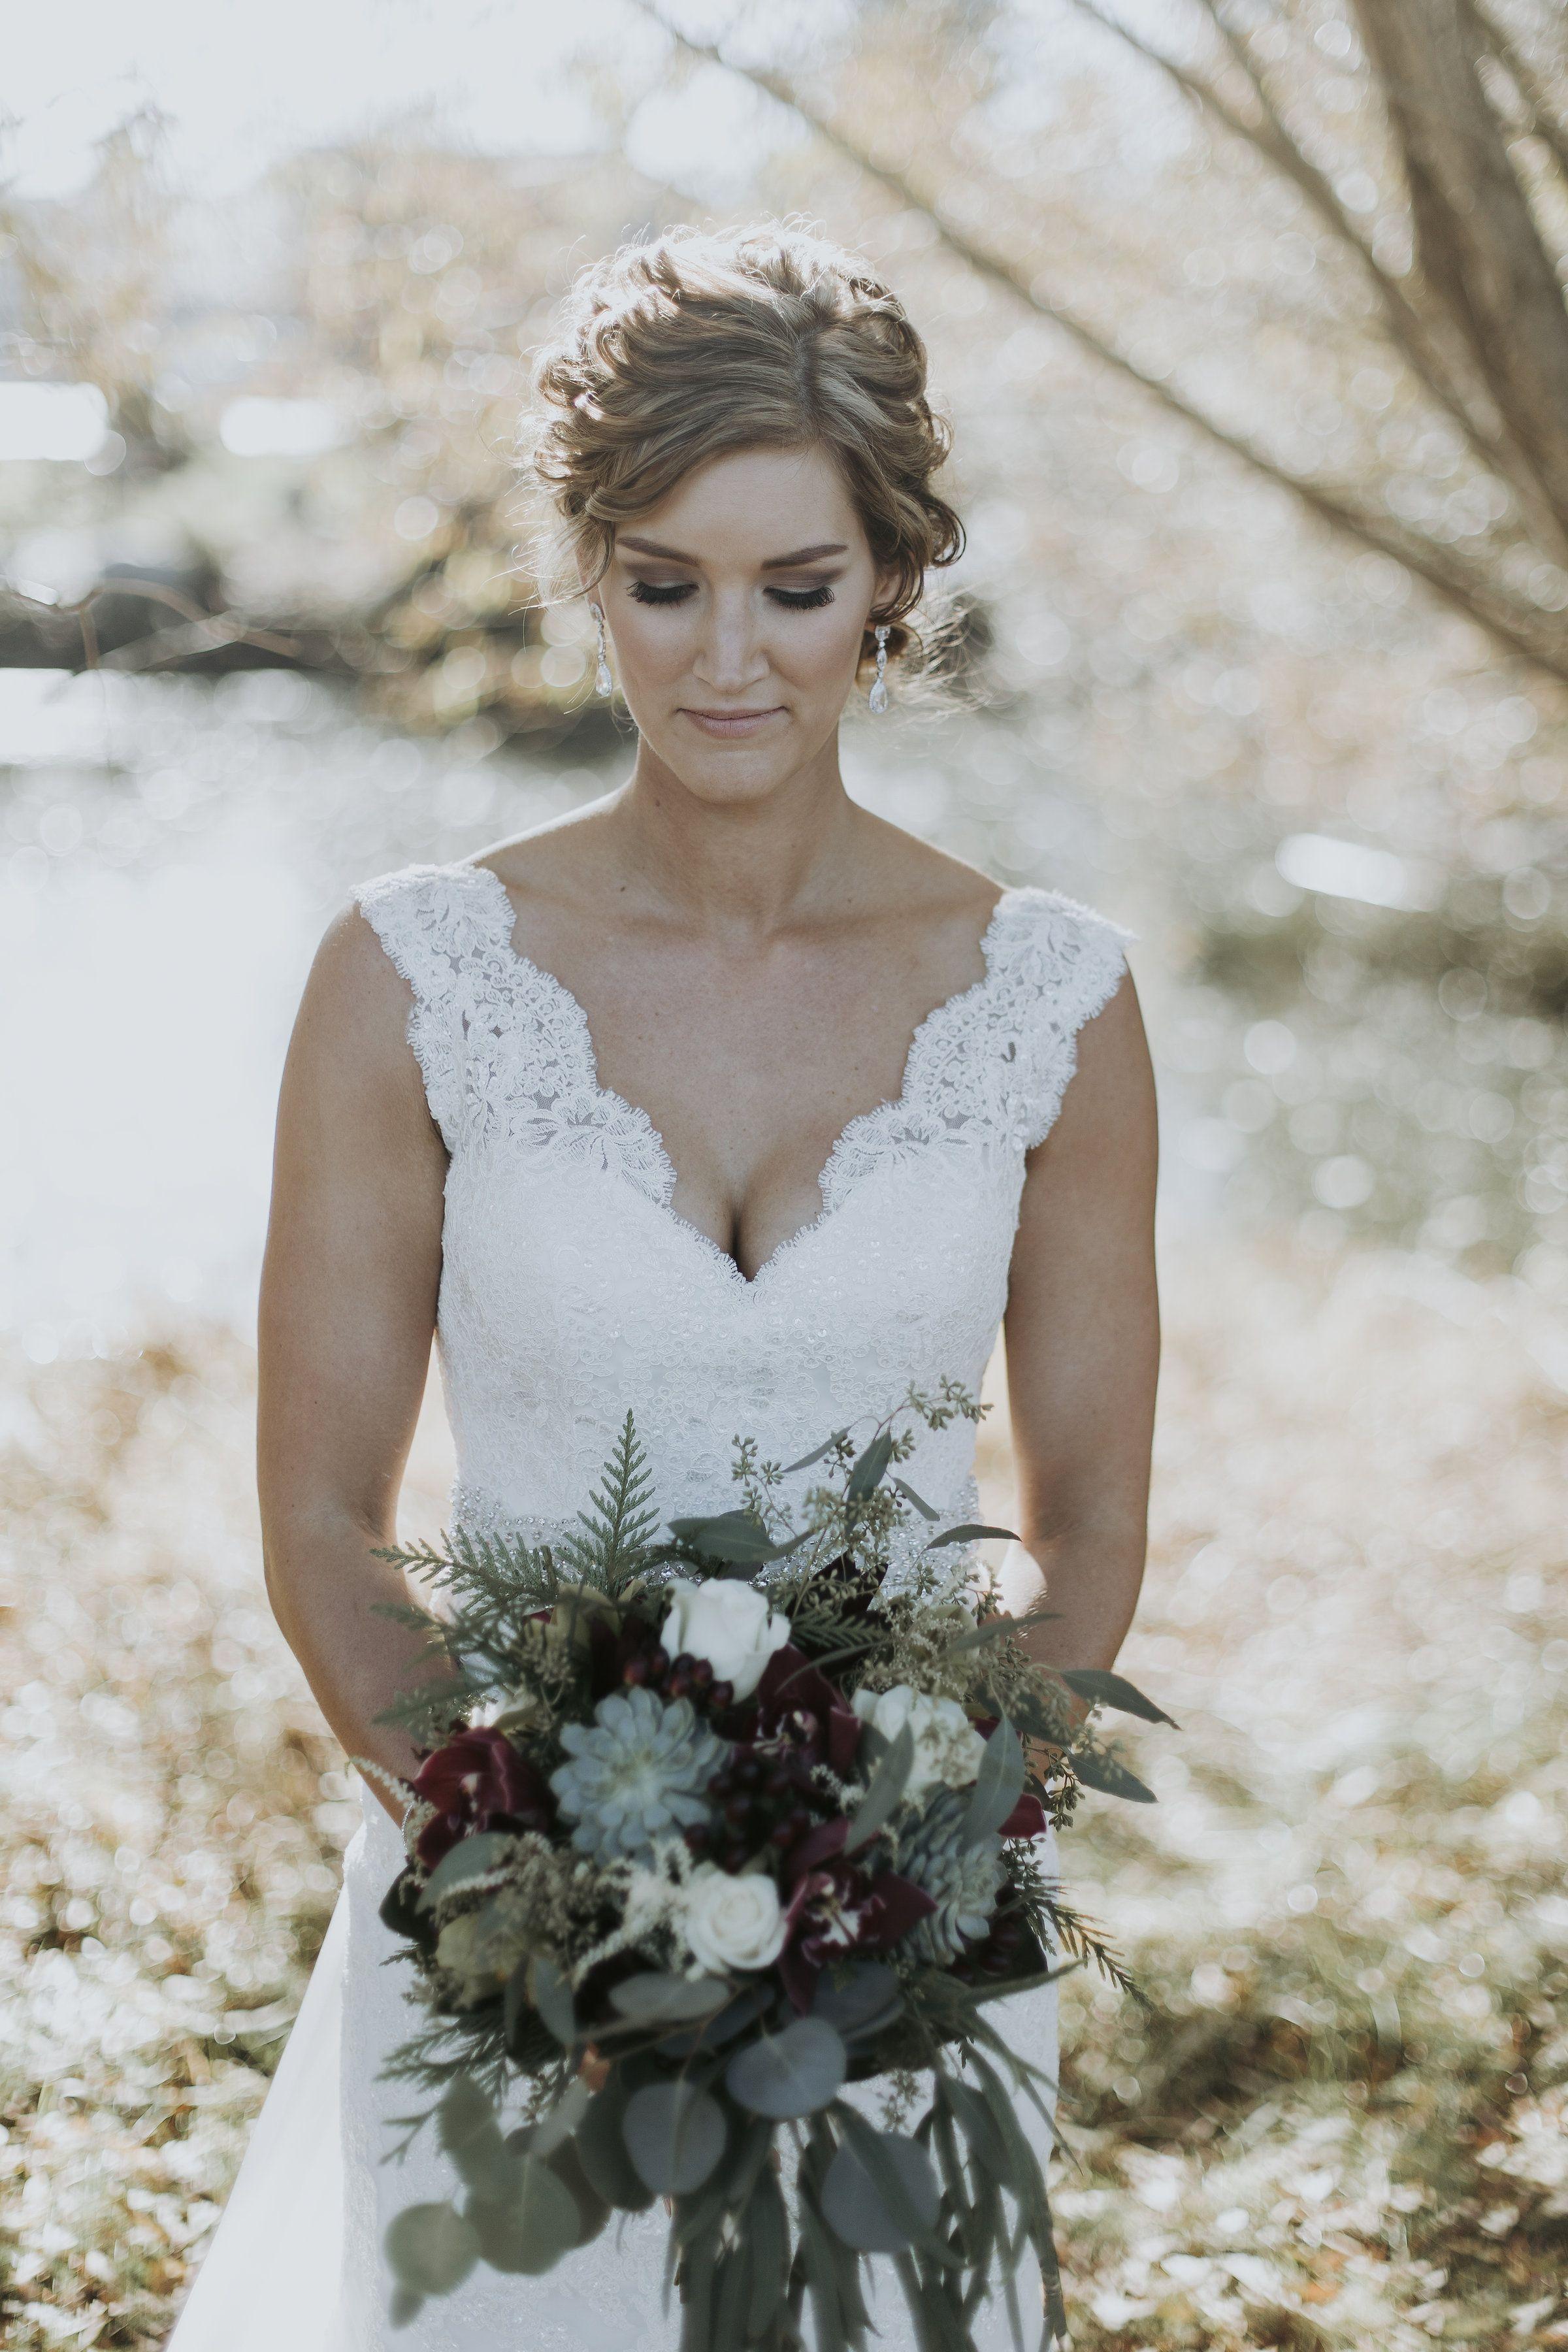 Elite wedding dresses  Pin by Miranda Frye on Wedding  Pinterest  Brides Bridal